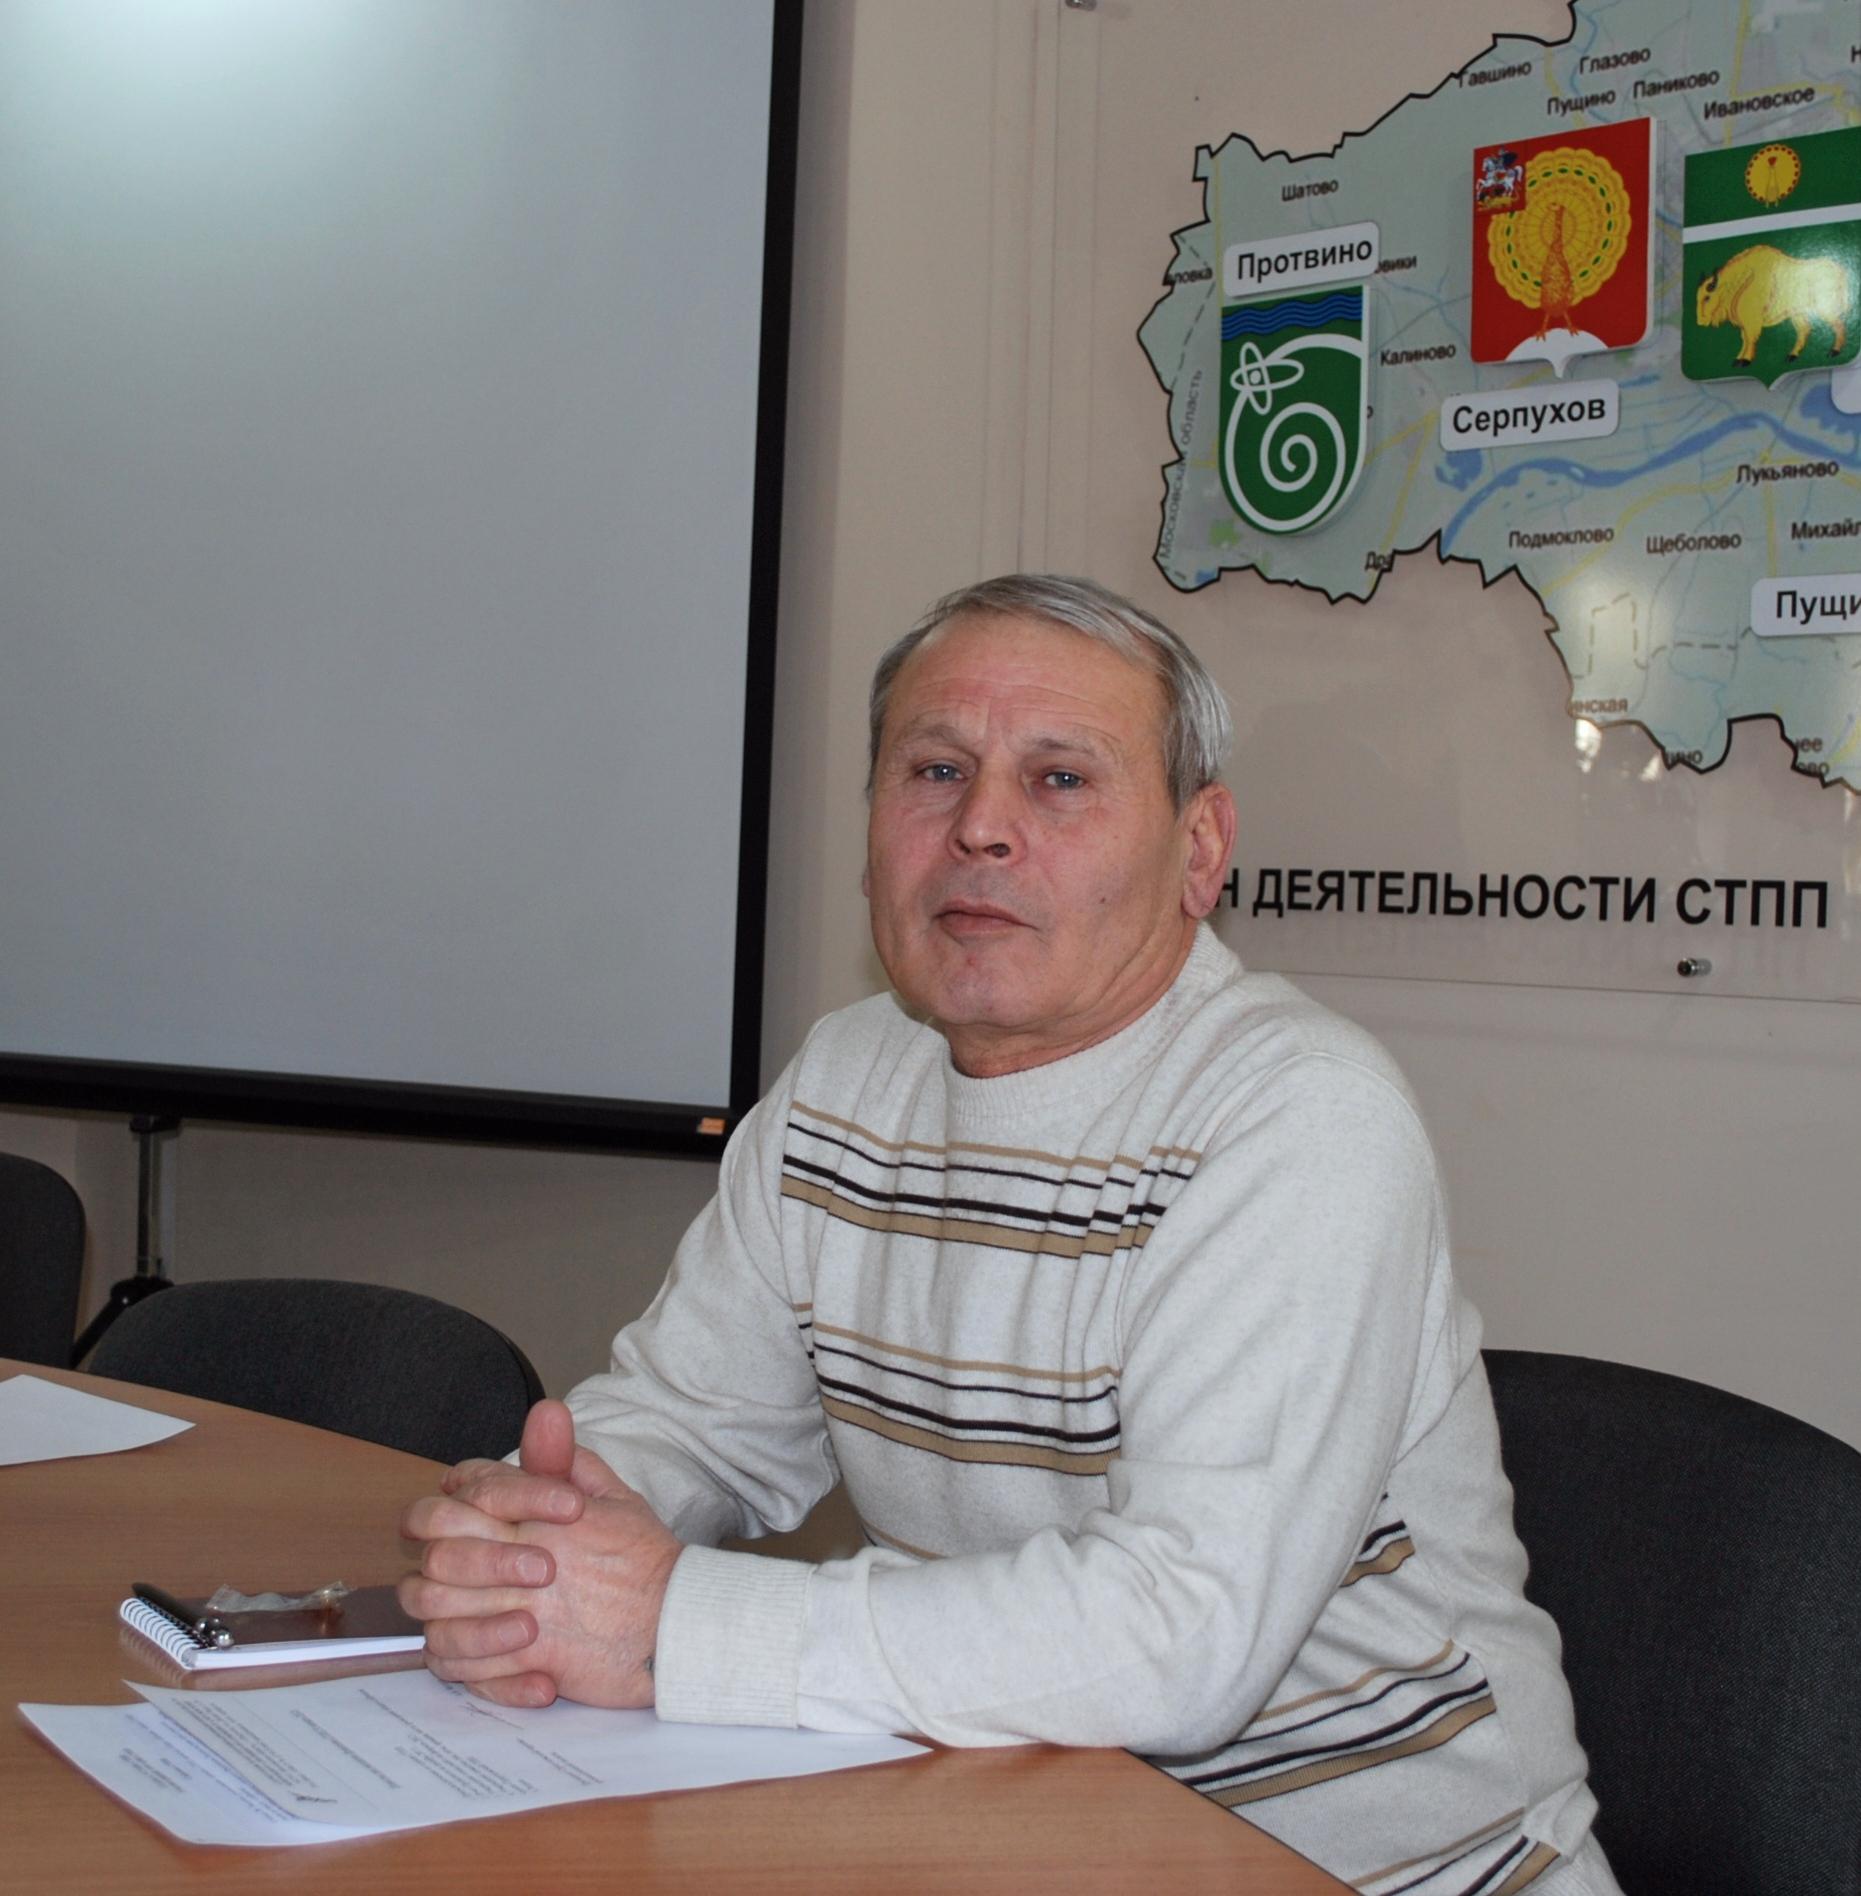 Апостолиди Анастас Павлович